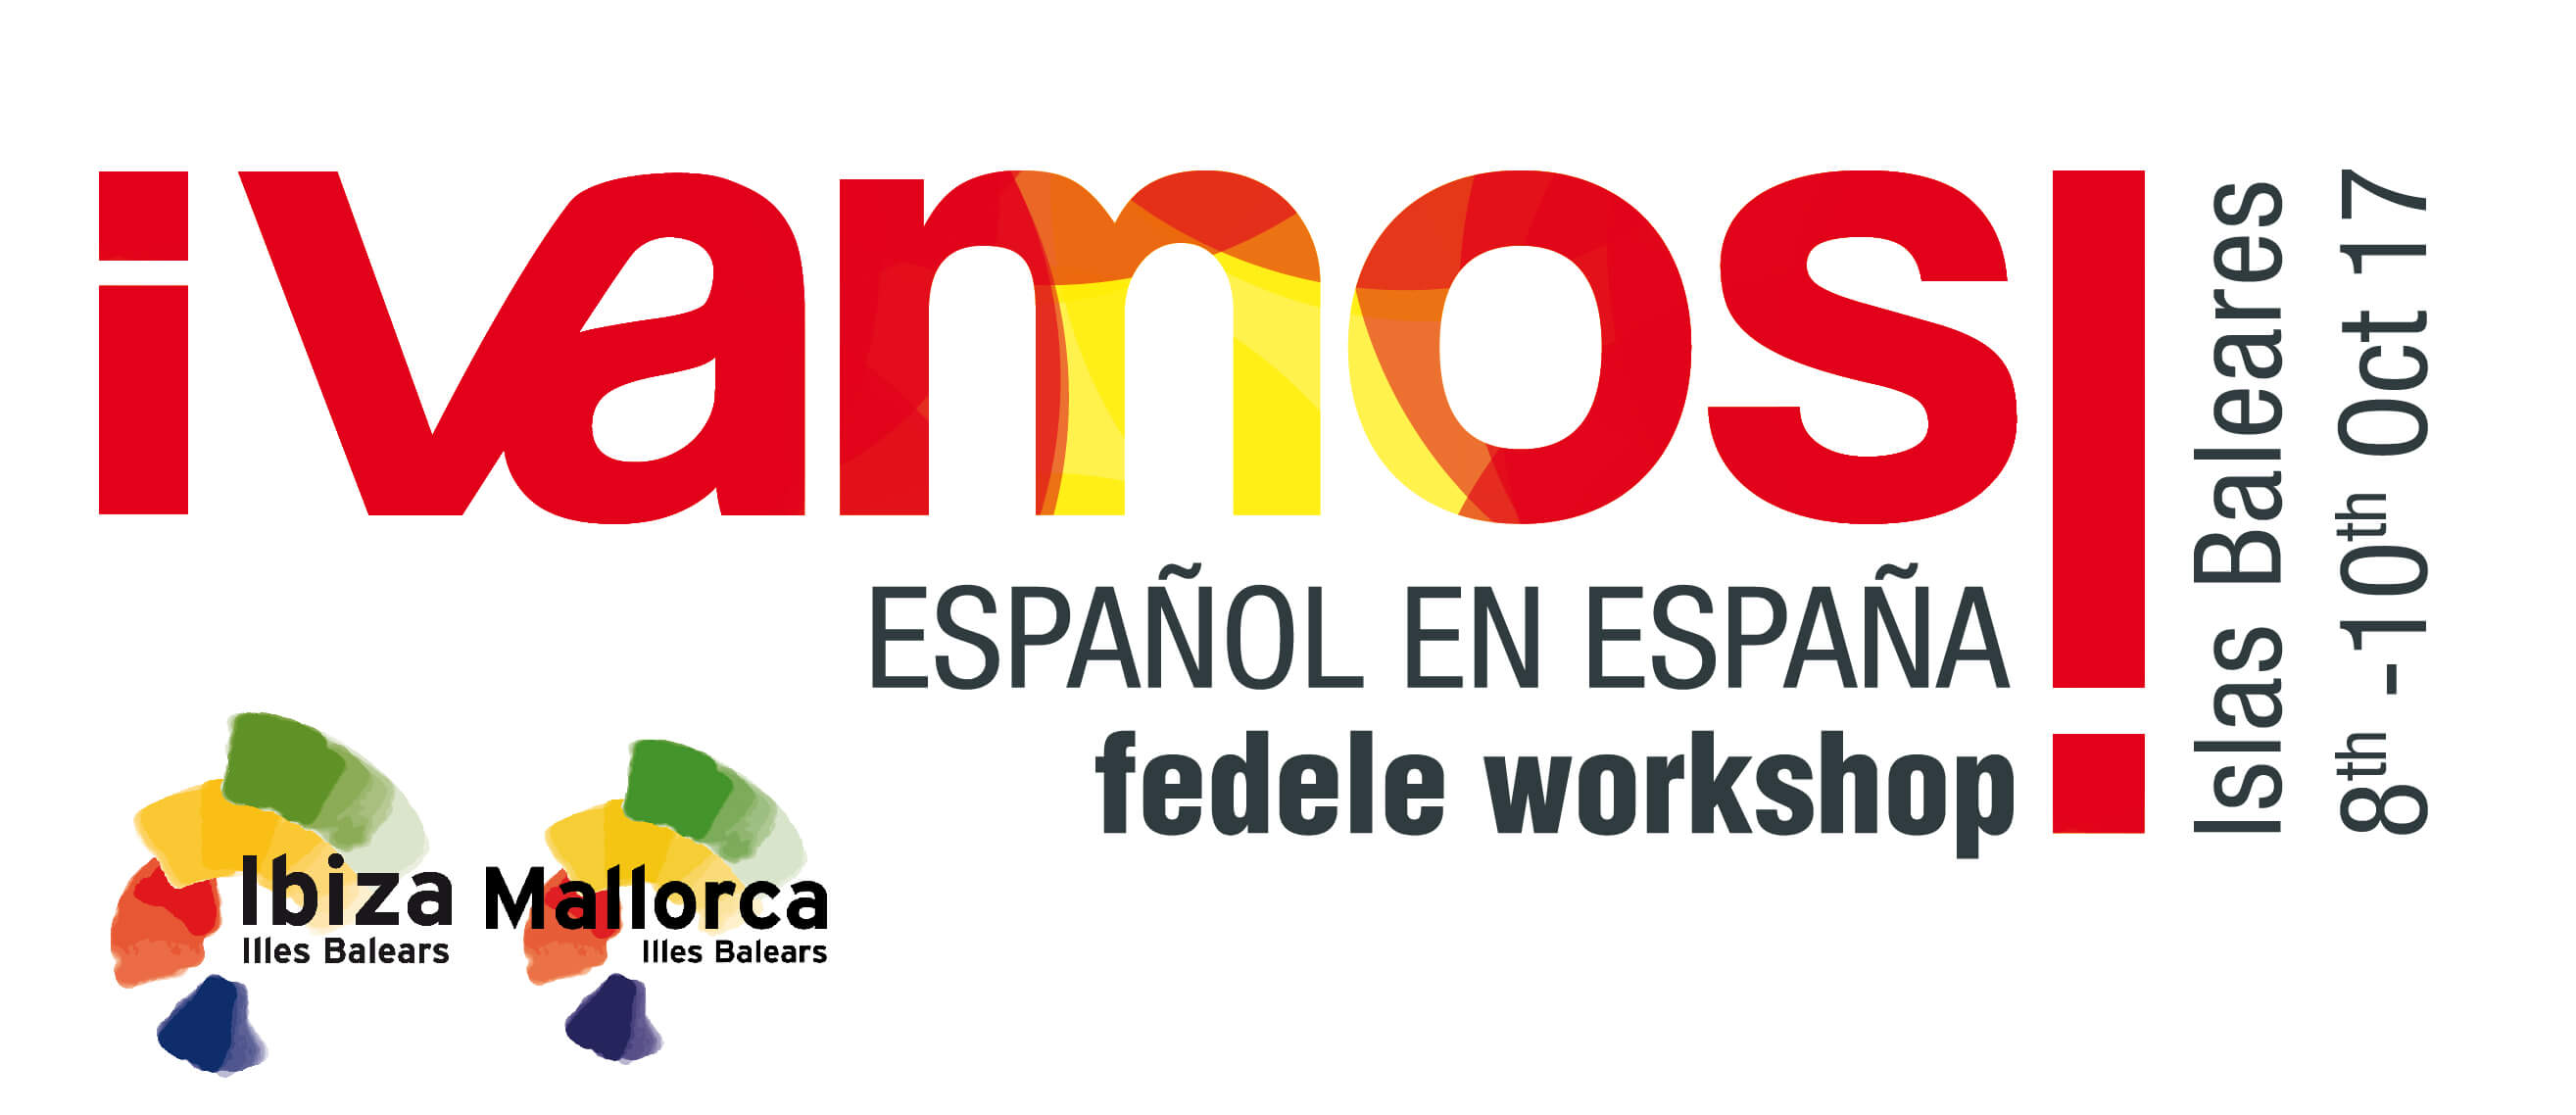 ¡vamos! español en españa fedele workshop 2017